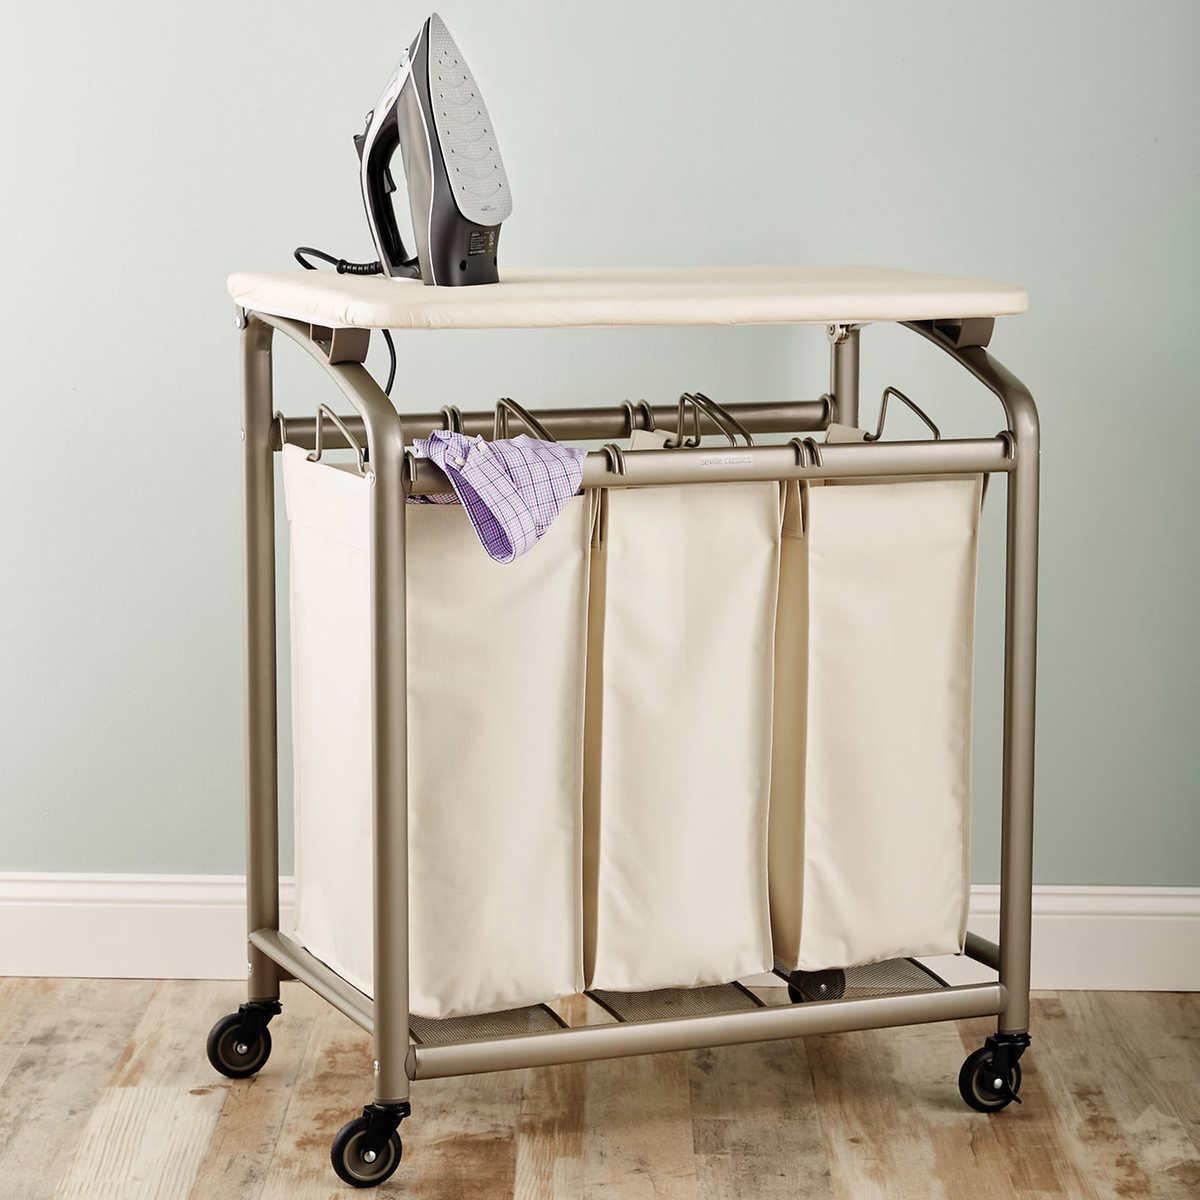 Design Laundry Folding Table seville classics 3 bag laundry sorter wfolding table